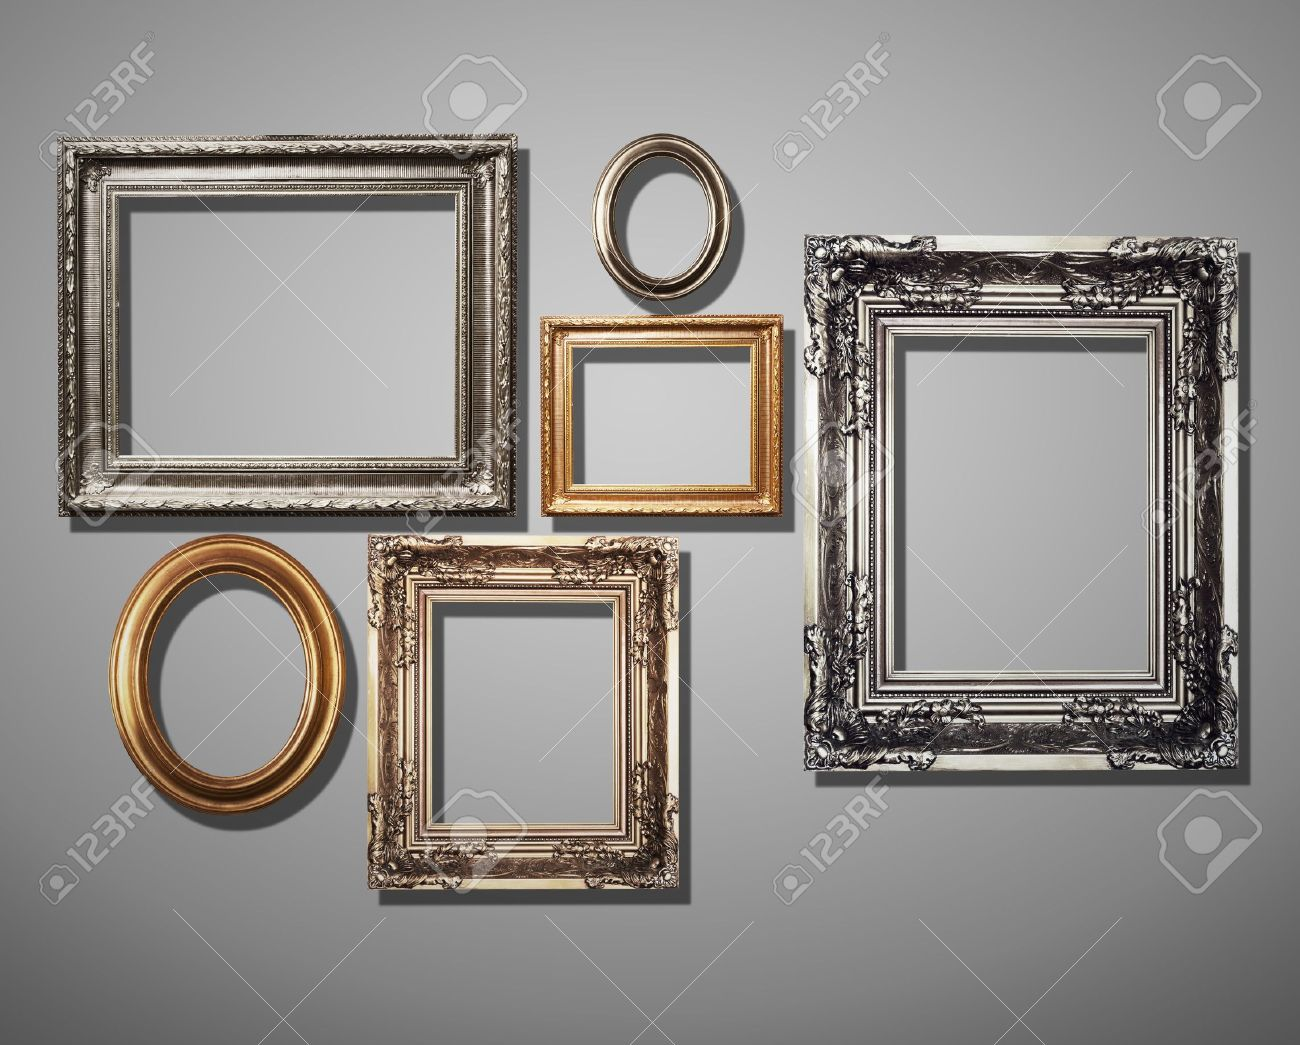 Frames auf graue Wand dekoriert. Standard-Bild - 20144003